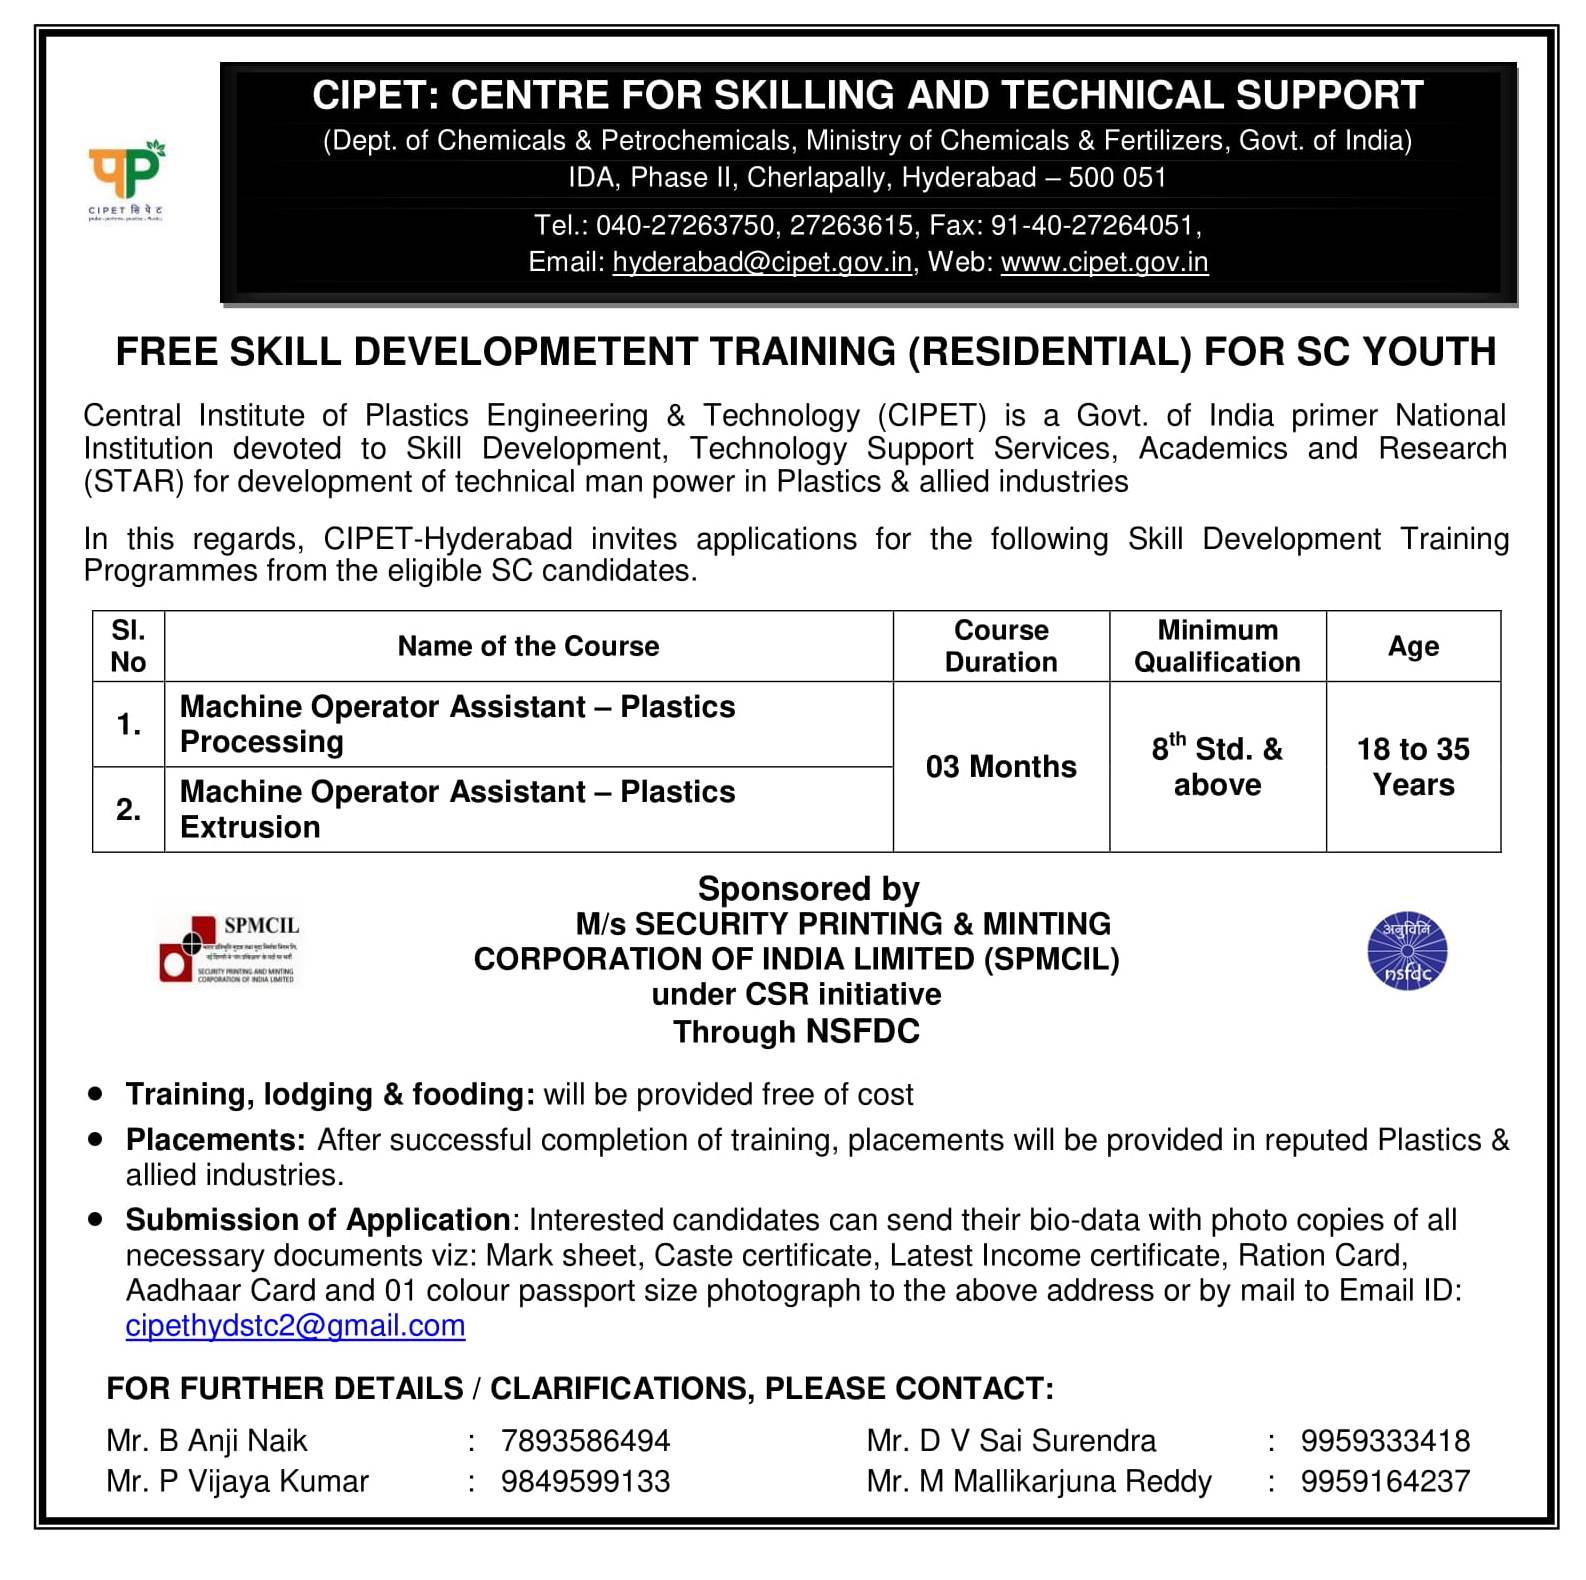 CIPET Central Institute of Plastic Engineering and Technology Free Skill Development Training Residential for Unemployed Youth Free Skill Development Training Residential for SC Youth | SKILL DEVELOPMENT TRAINING PROGRAMME SPONSORED BY M/S SECURITY PRINTING & MINTING CORPORATION OF INDIA LIMITED (SPMCIL) UNDER CSR INITIATIVE, THROUGH NSFDC హైదరాబాద్లోని సెంట్రల్ ఇన్స్టిట్యూట్ ఆఫ్ ప్లాస్టిక్స్ ఇంజినీరింగ్ అండ్ టెక్నాలజీ (సీపెట్), గెయిల్ (ఇండియా)లిమిటెడ్, న్యూదిల్లీ వారి సహకారంతో కింది కోర్సులో నిరుద్యోగులకు ఉచిత శిక్షణా కార్యక్రమం నిర్వహిస్తోంది./2019/07/CIPET-Central-Institute-of-Plastic-Engineering-and-Technology-Free-Skill-Development-free-Training-Residential-for-Unemployed-Youth-registration-form-